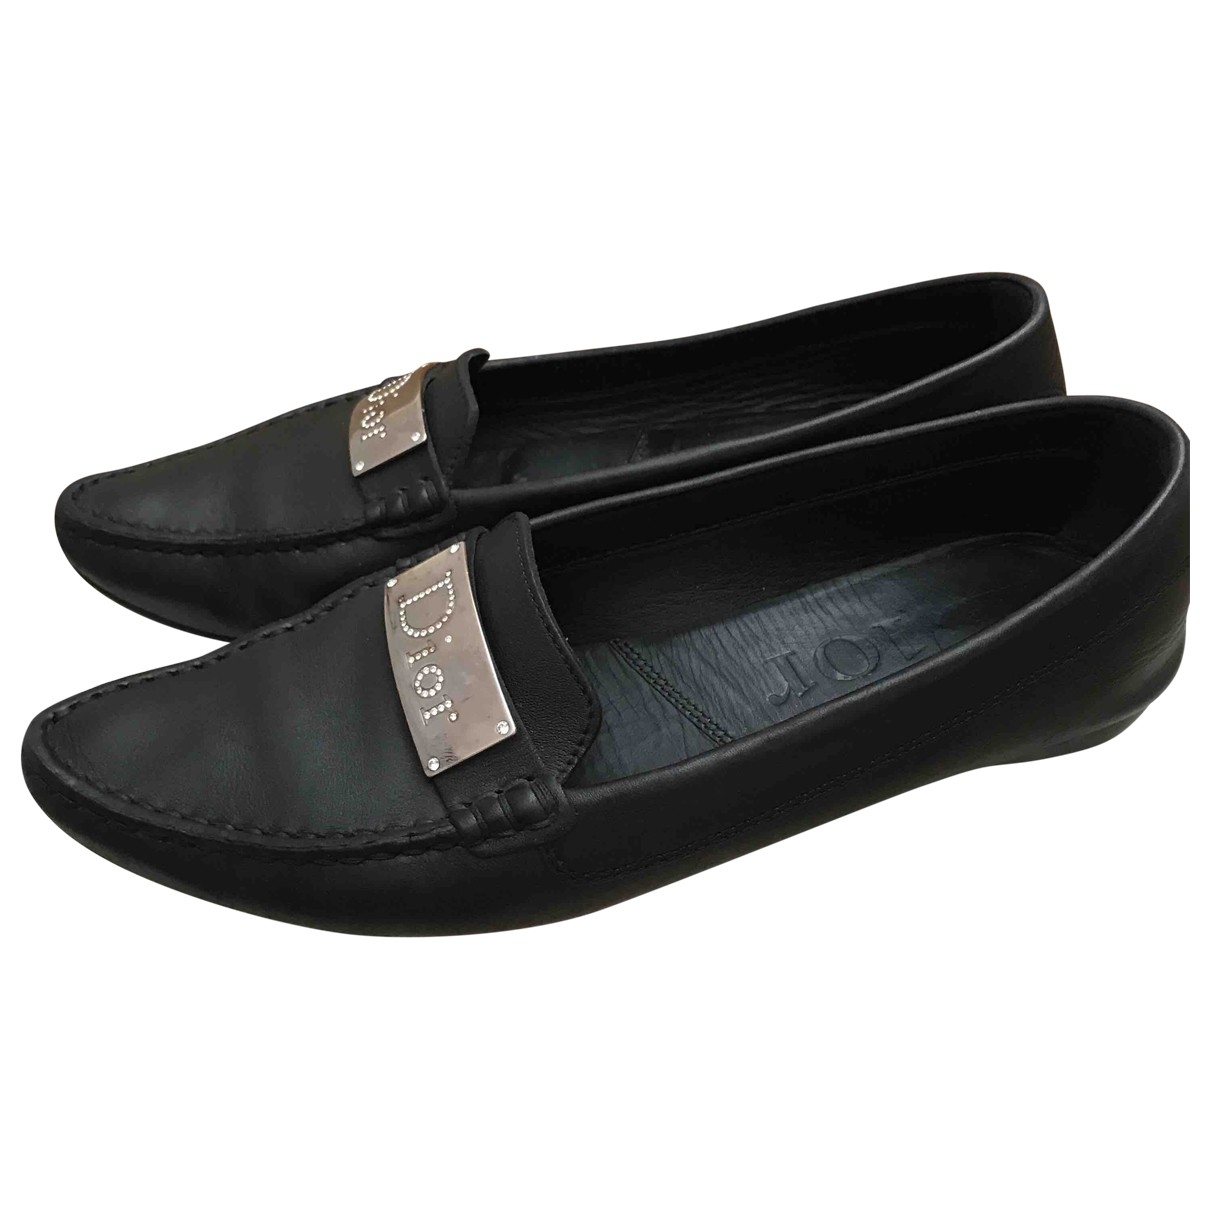 Dior \N Black Leather Flats for Women 36 EU